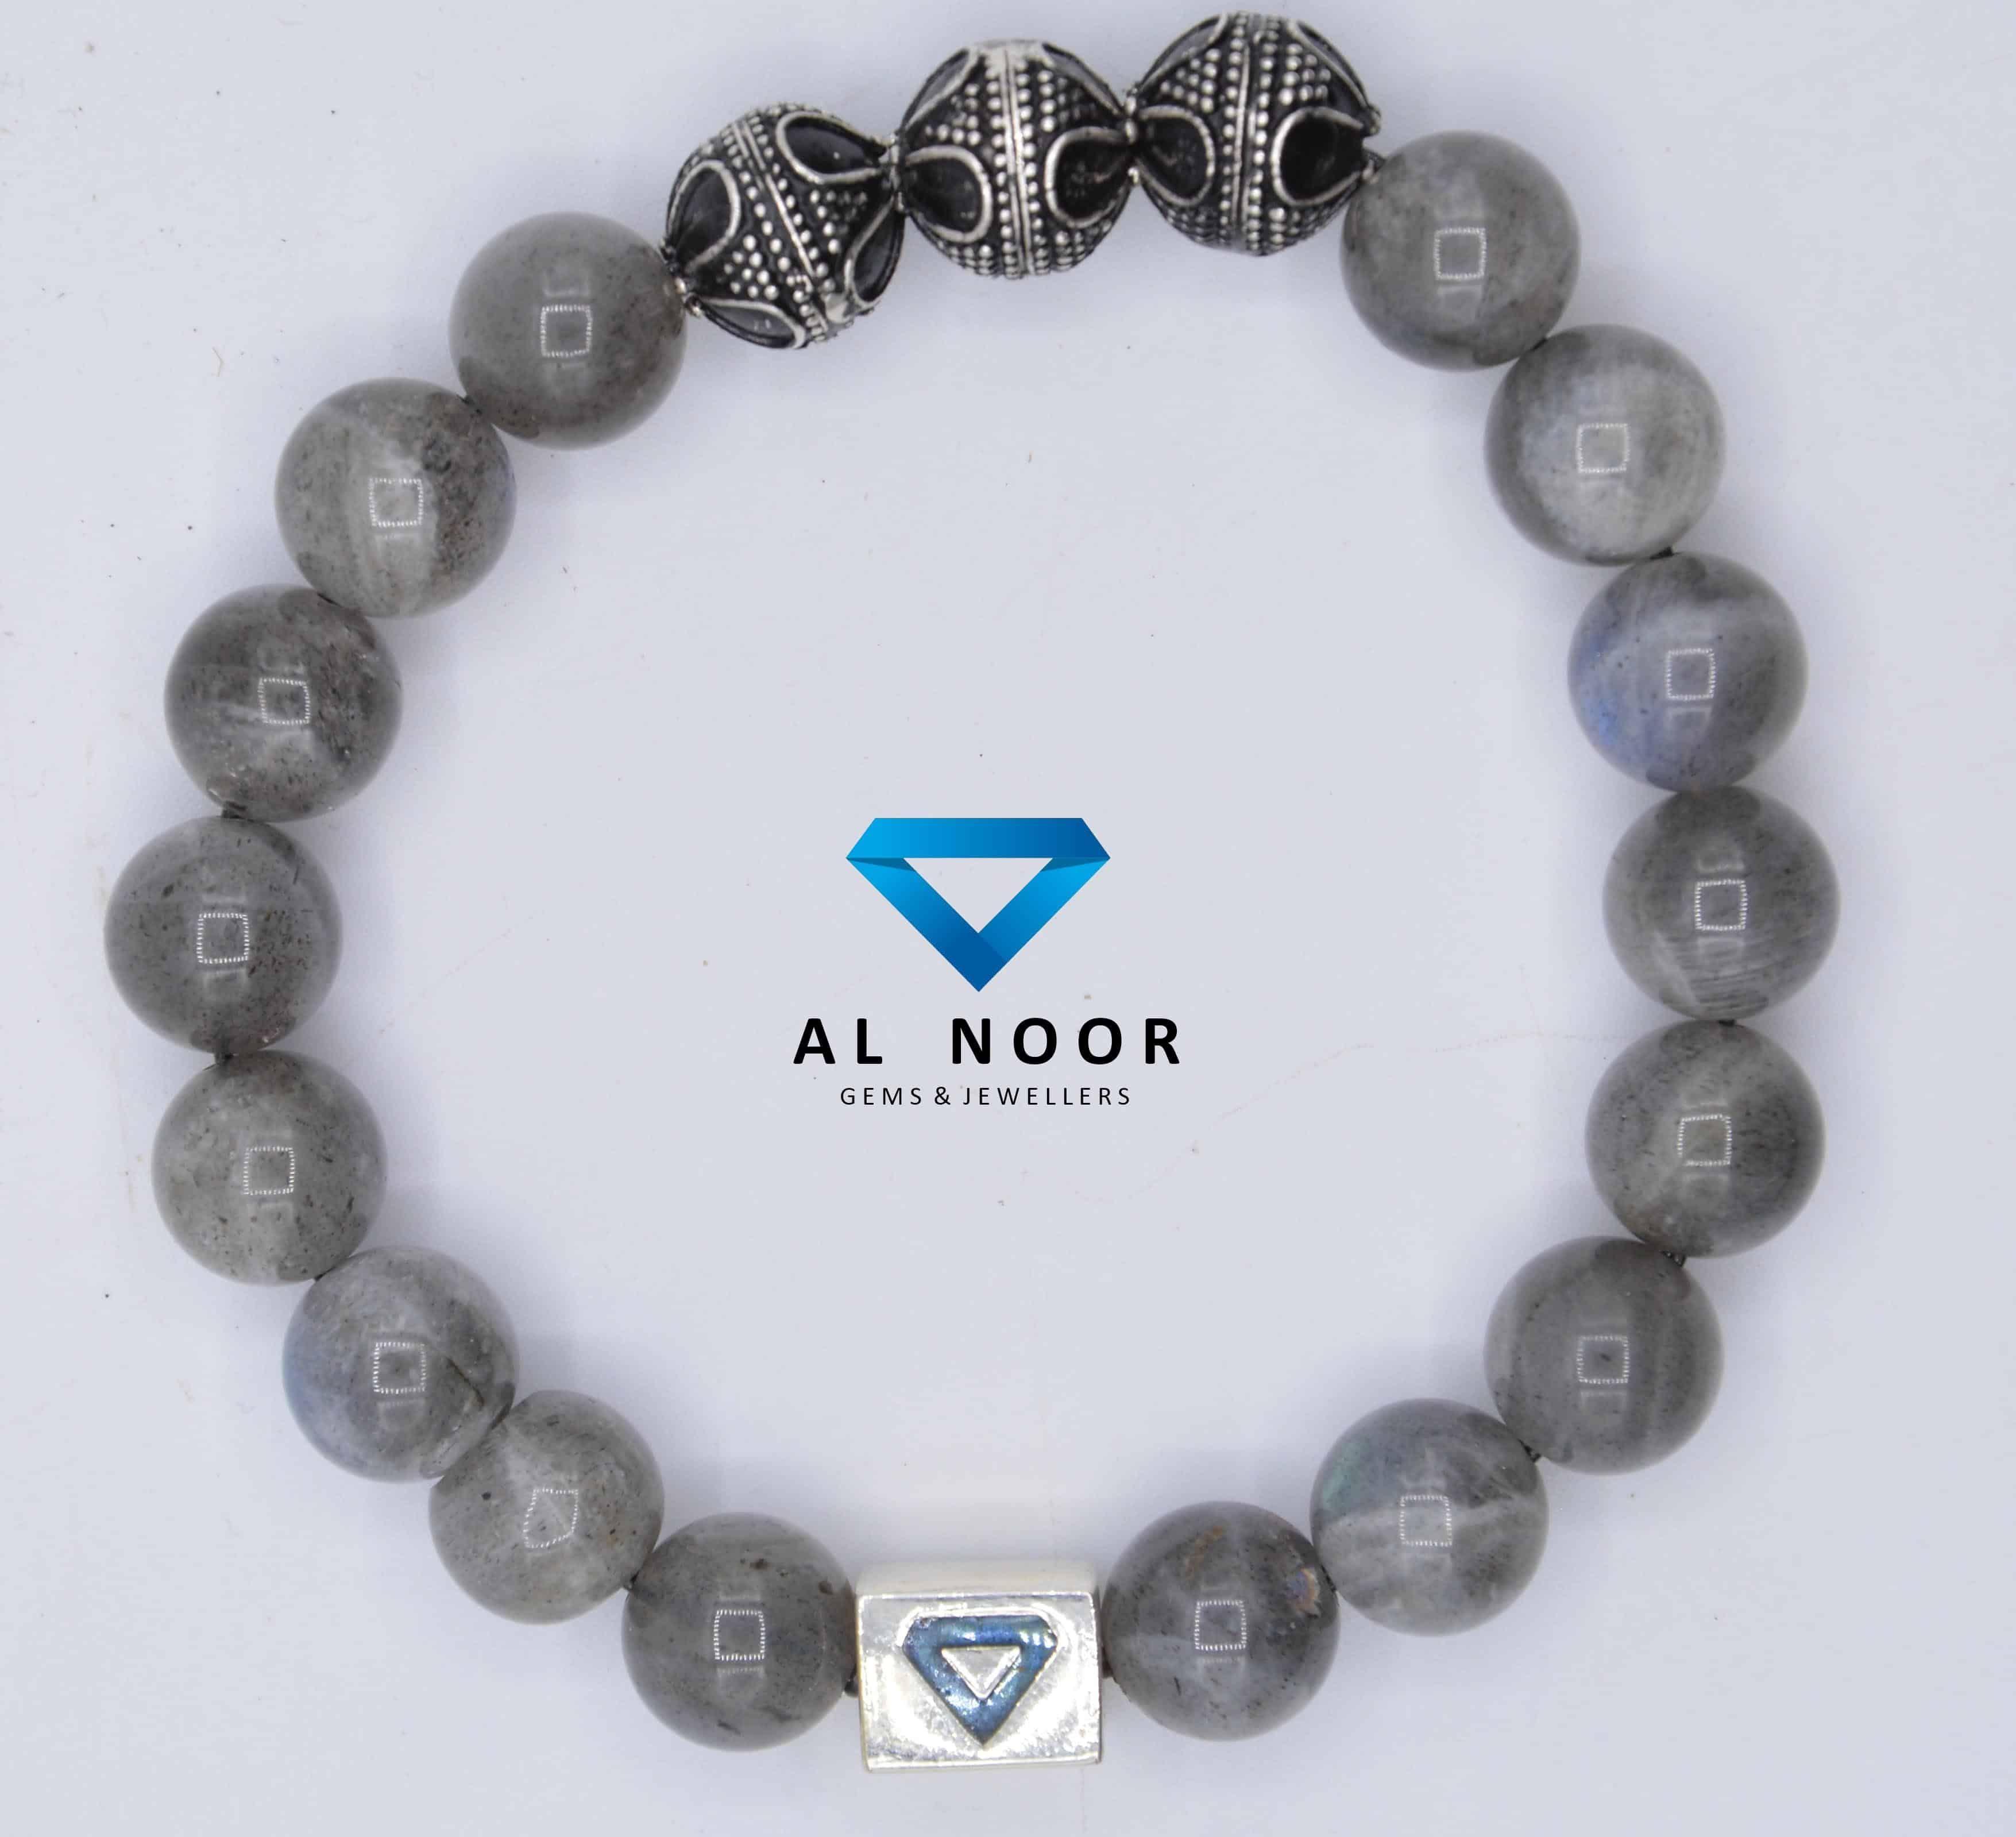 3 to 4 mm Stone Size Gemstone Bracelet Labradorite Bracelet Beaded Women/'s Bangle Silver 925 Sterling Ball Bracelet